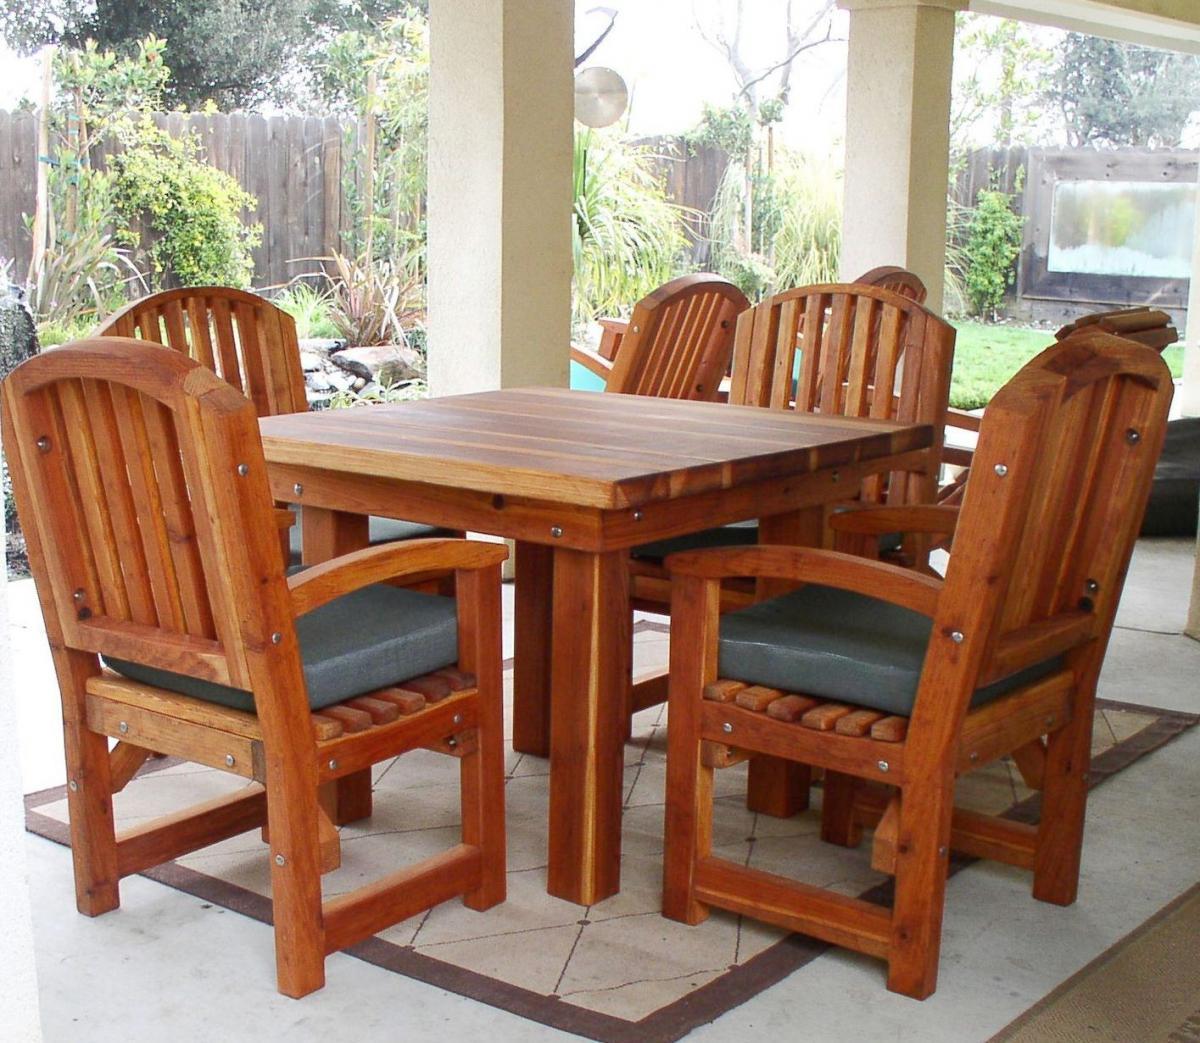 Square Patio Tables